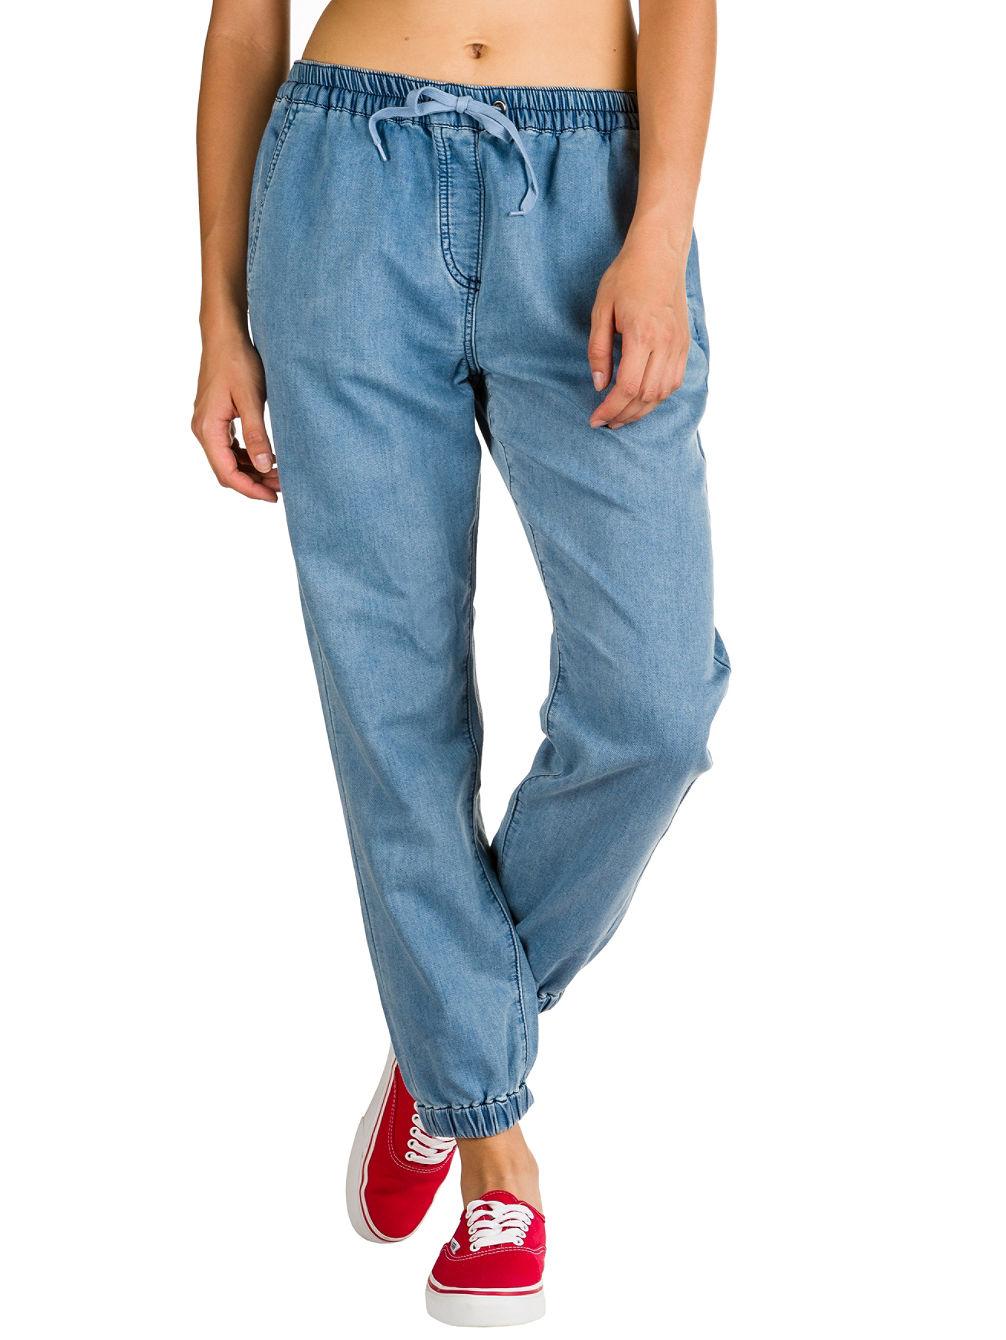 rip curl avesta jeans online kaufen bei blue. Black Bedroom Furniture Sets. Home Design Ideas